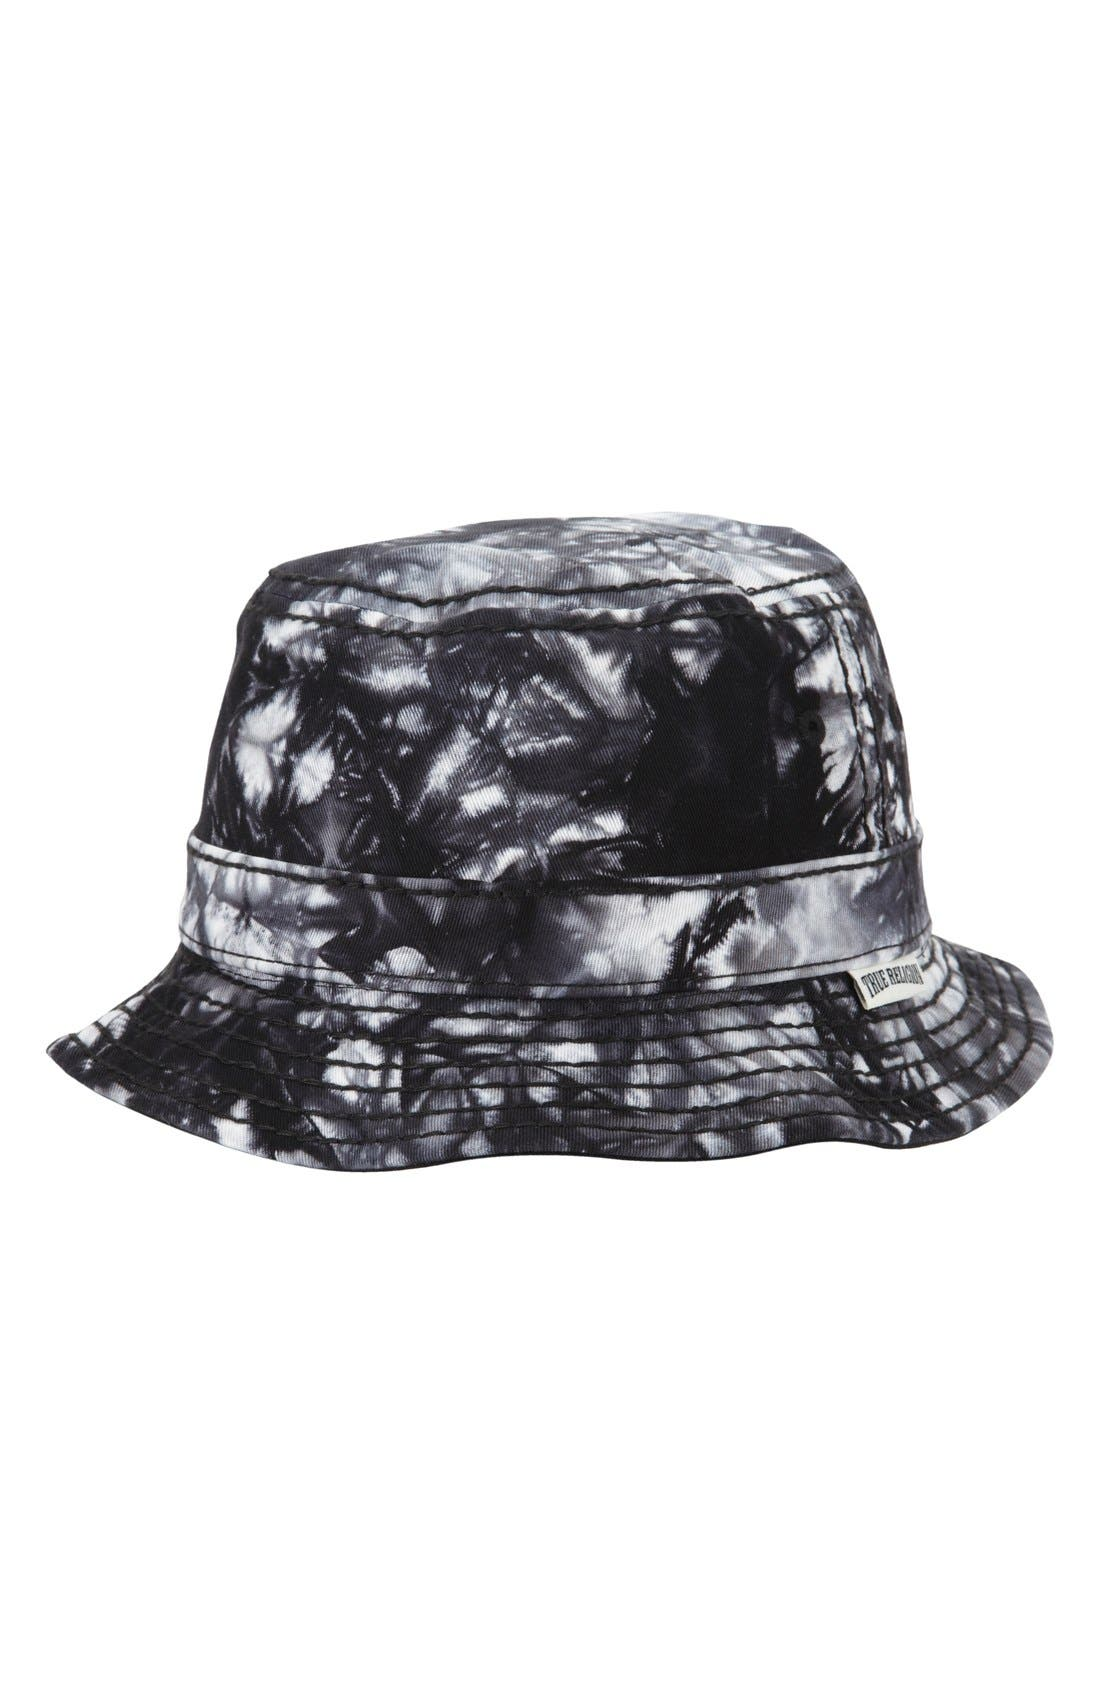 Marble Dye Bucket Hat,                             Main thumbnail 1, color,                             001